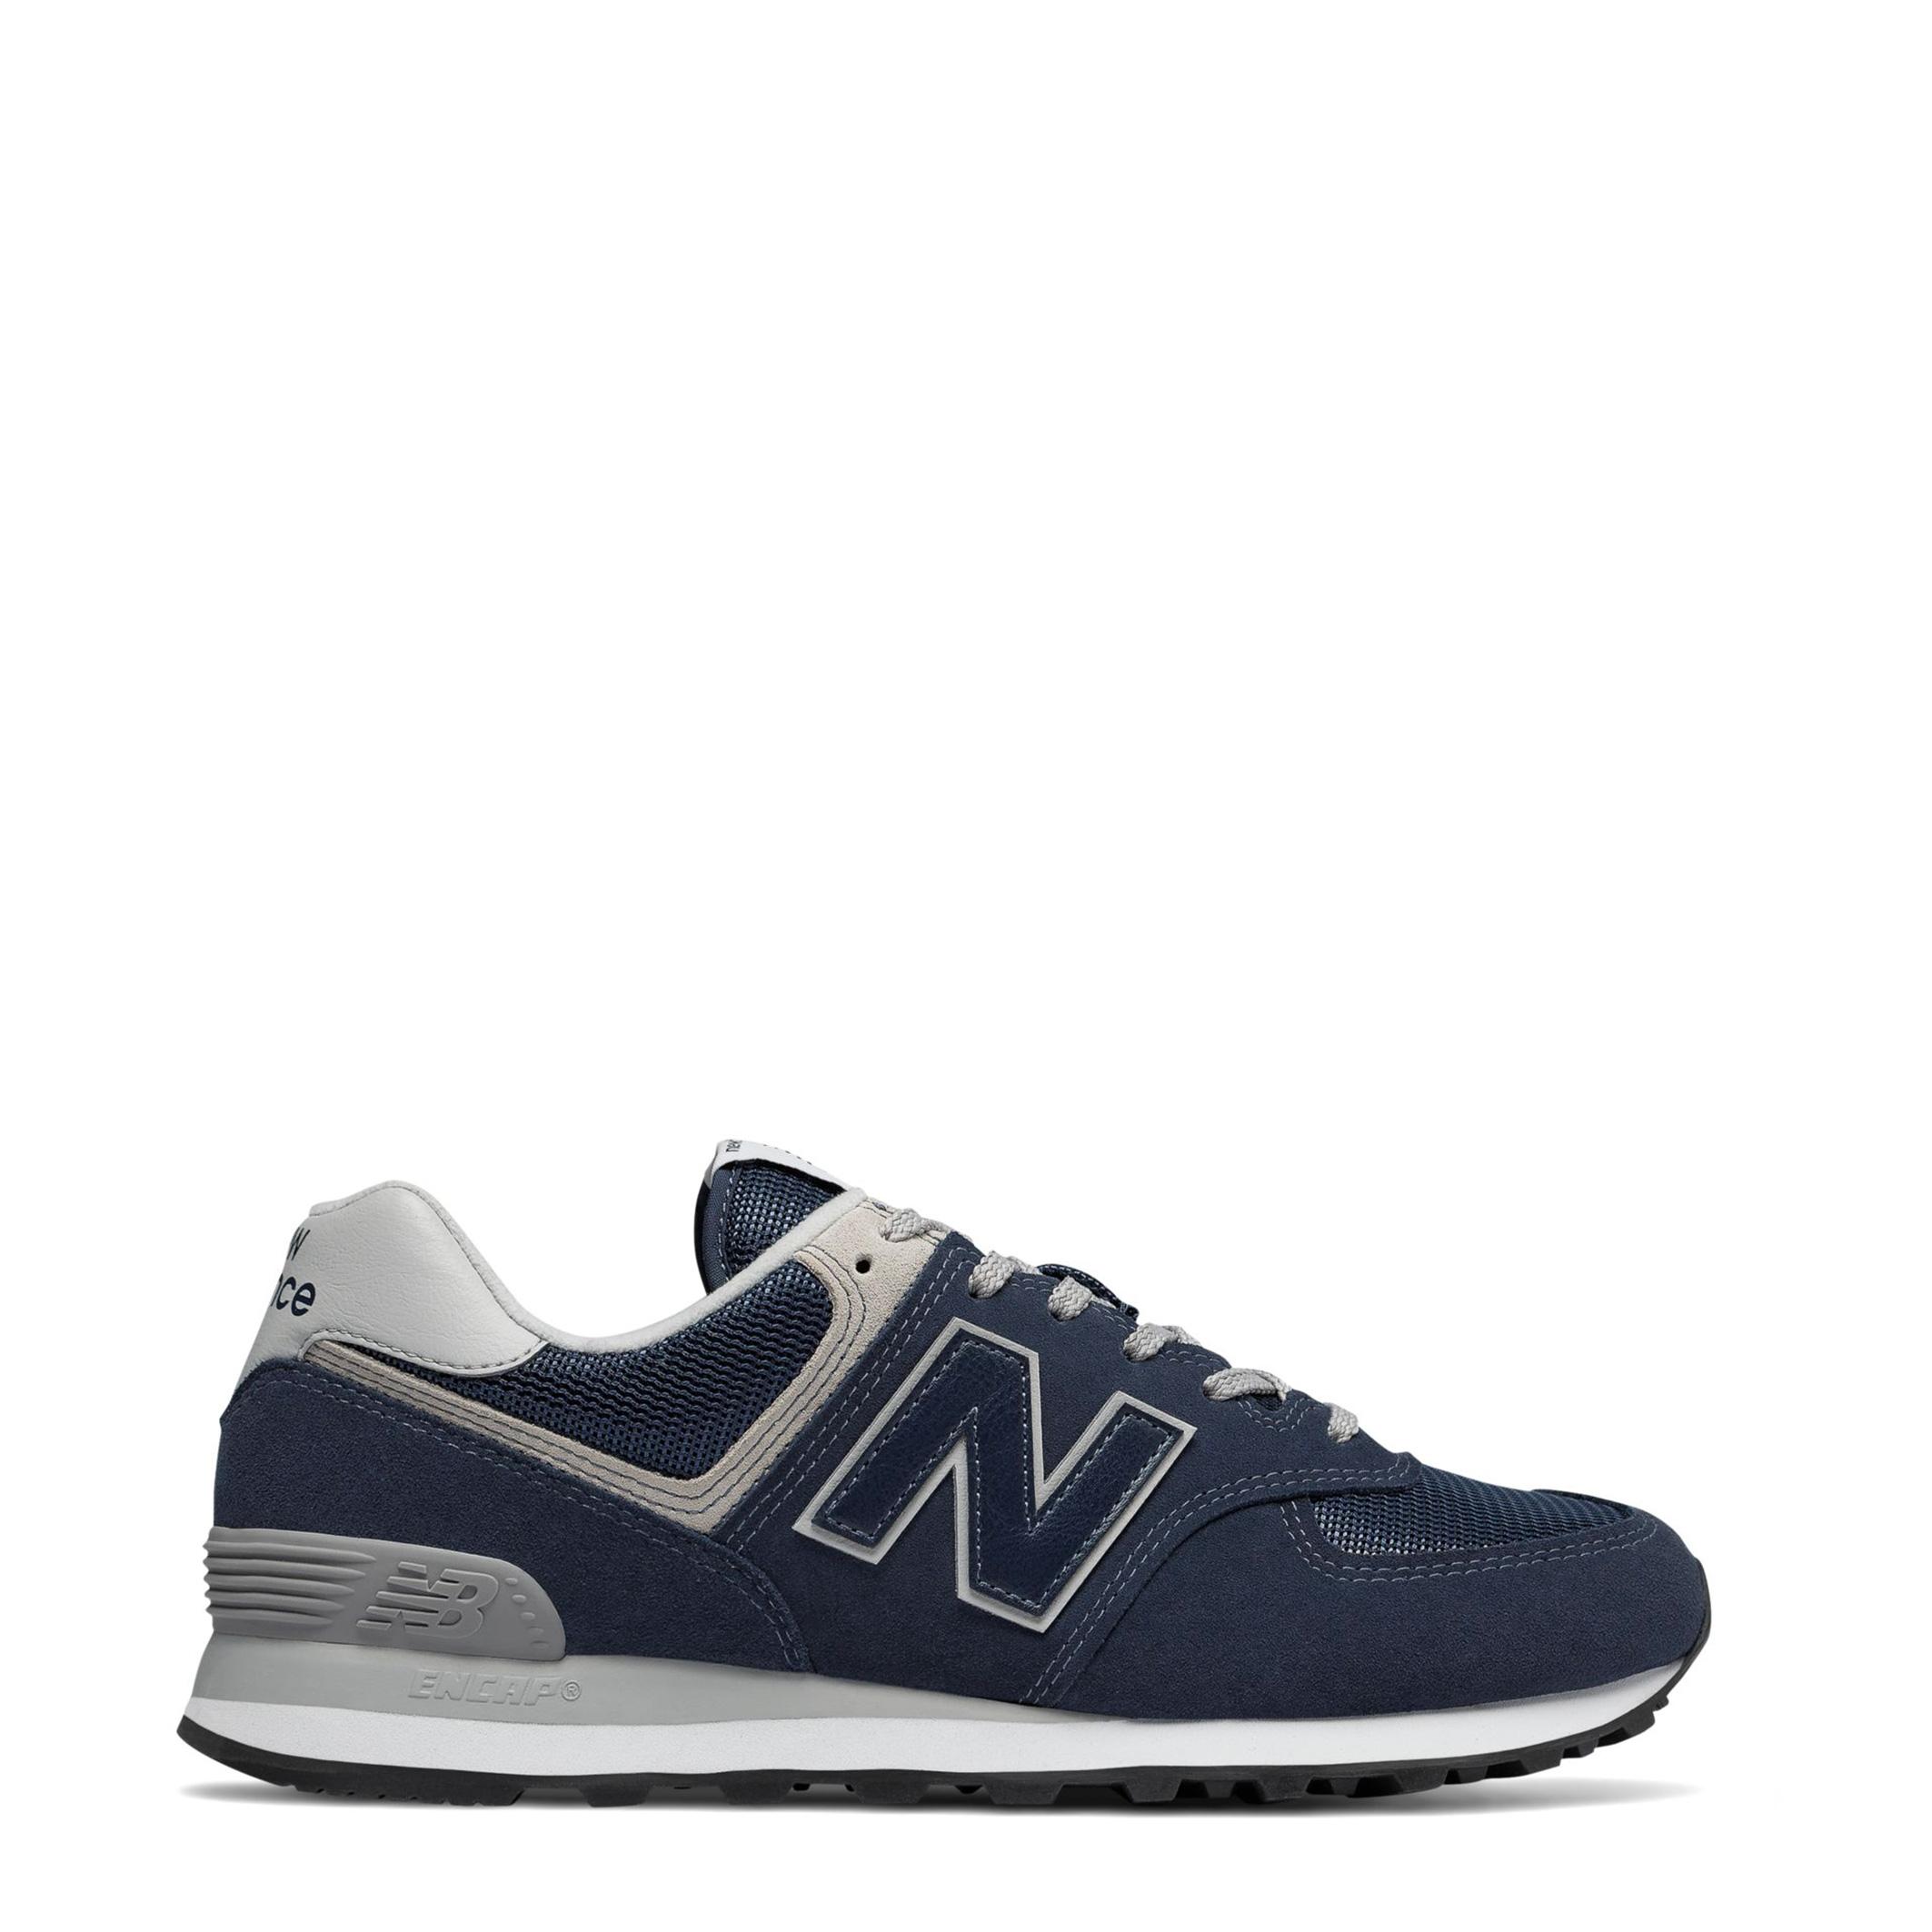 New balance ml574  Herren blu - 91905